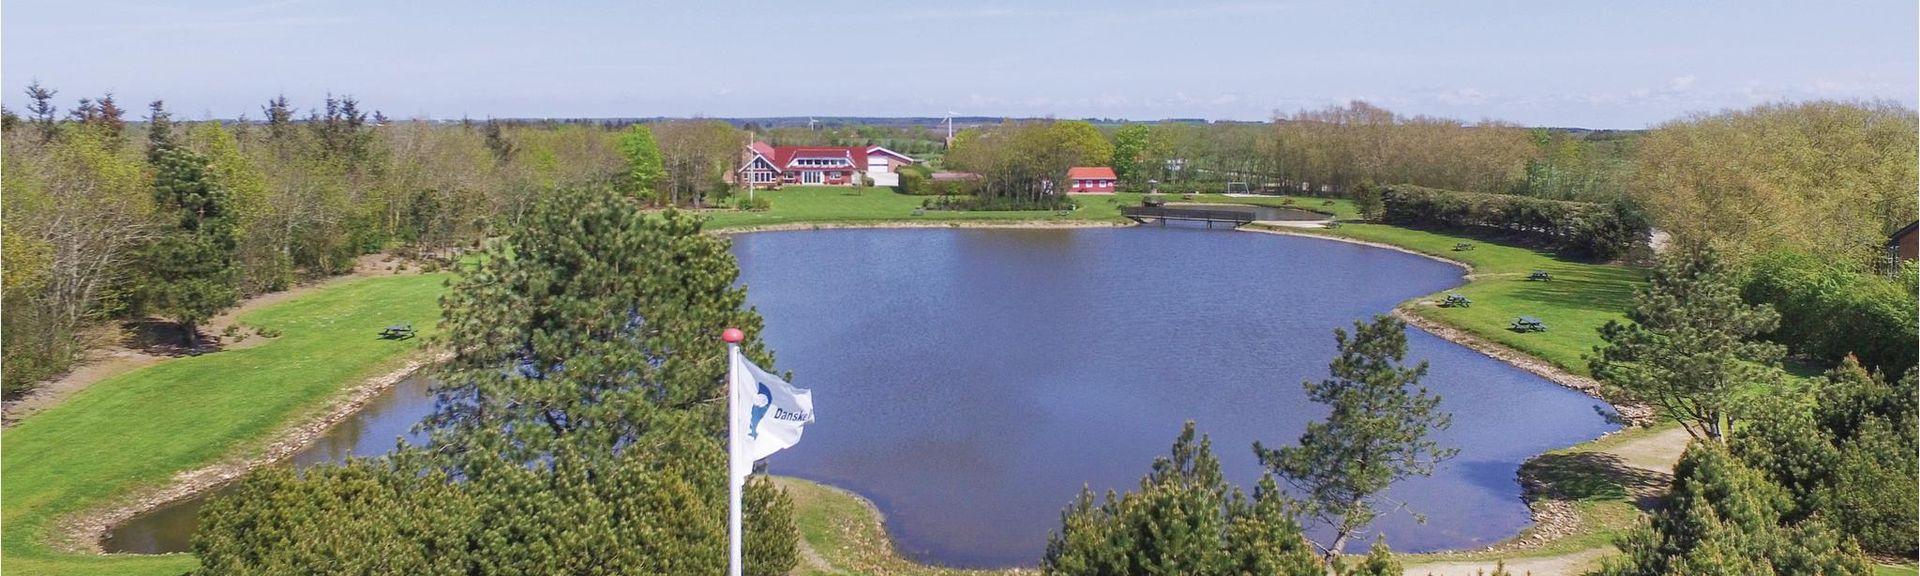 Spjald, Midtjylland, Denmark